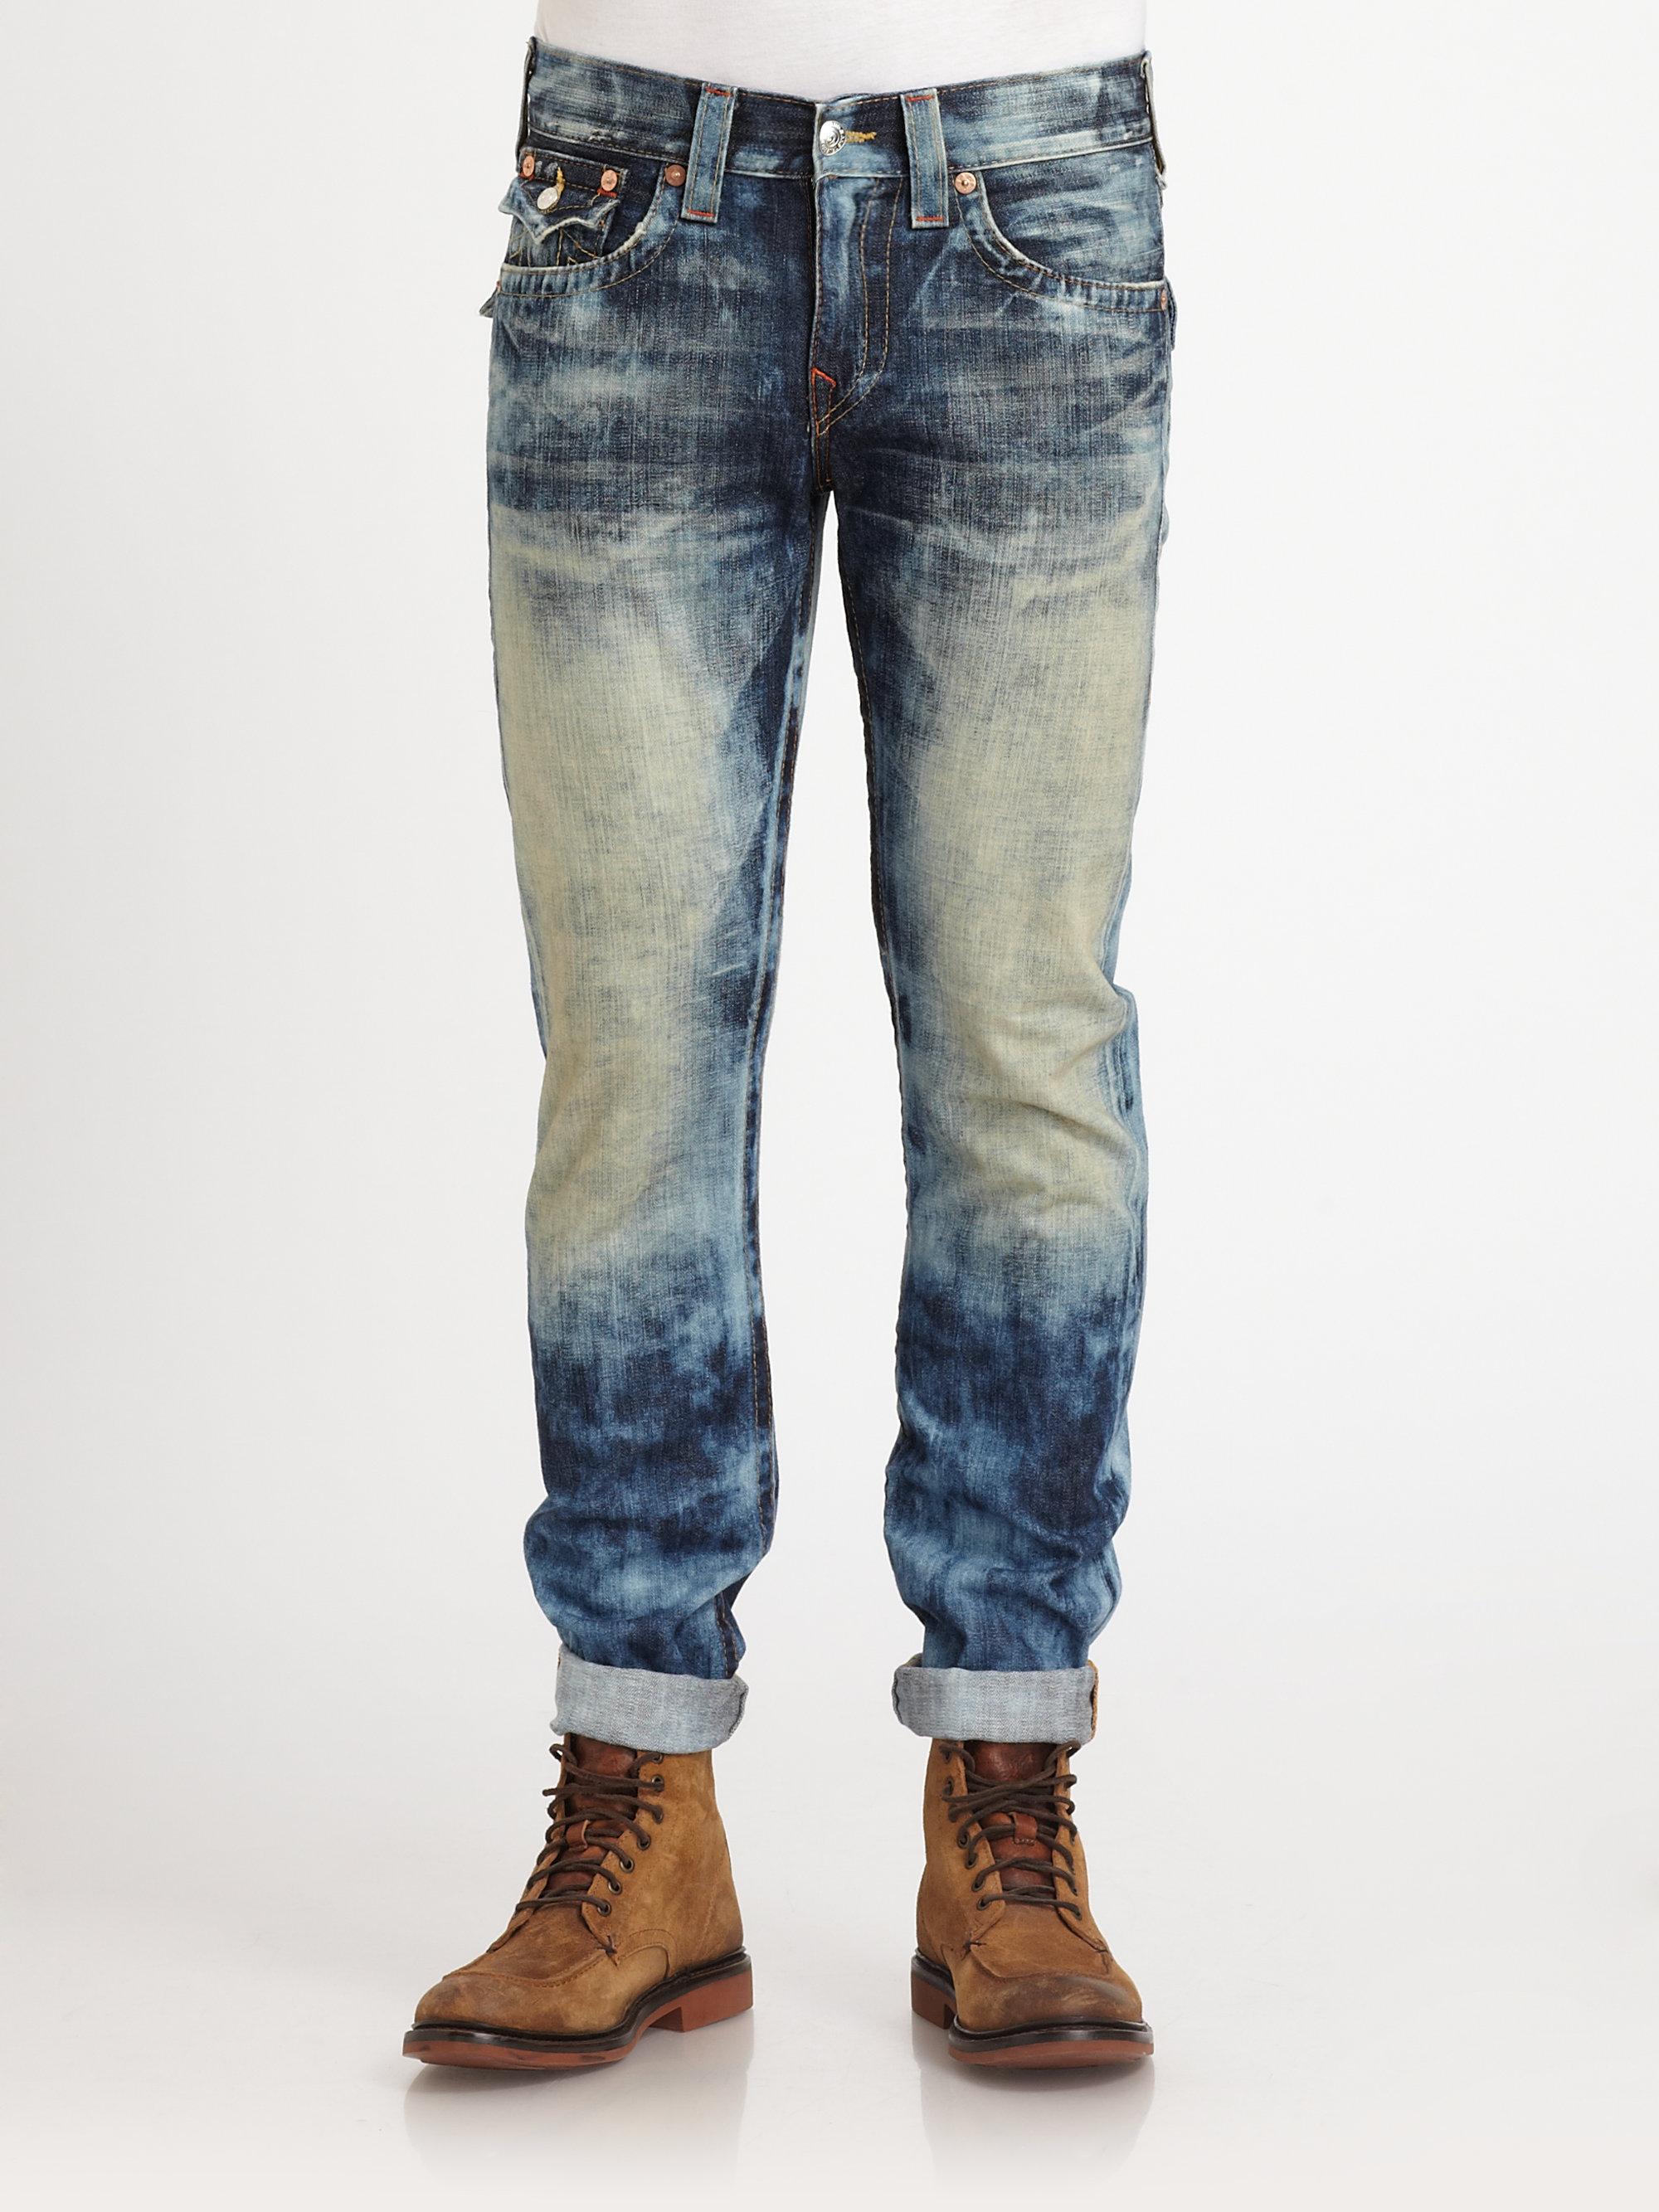 lyst true religion ricky straightleg jeans in blue for men. Black Bedroom Furniture Sets. Home Design Ideas